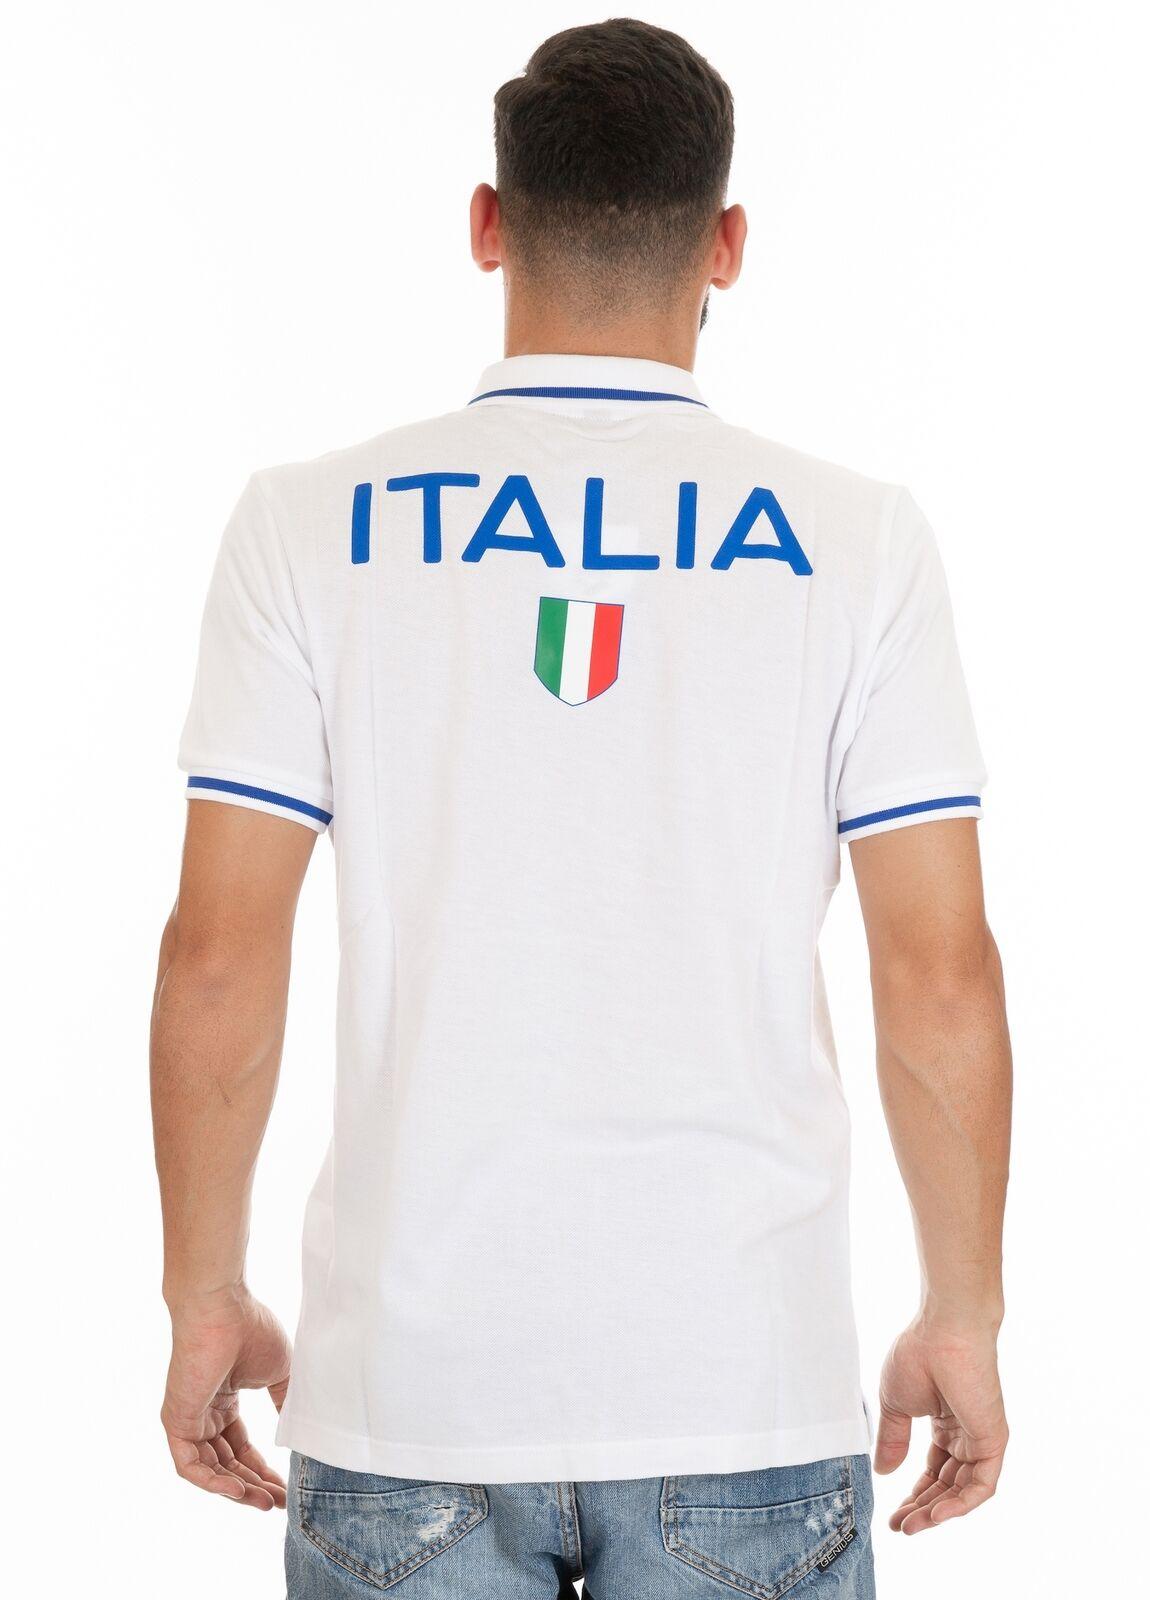 ARENA - POLO ITALY FIN S S - 001014108 - bianca